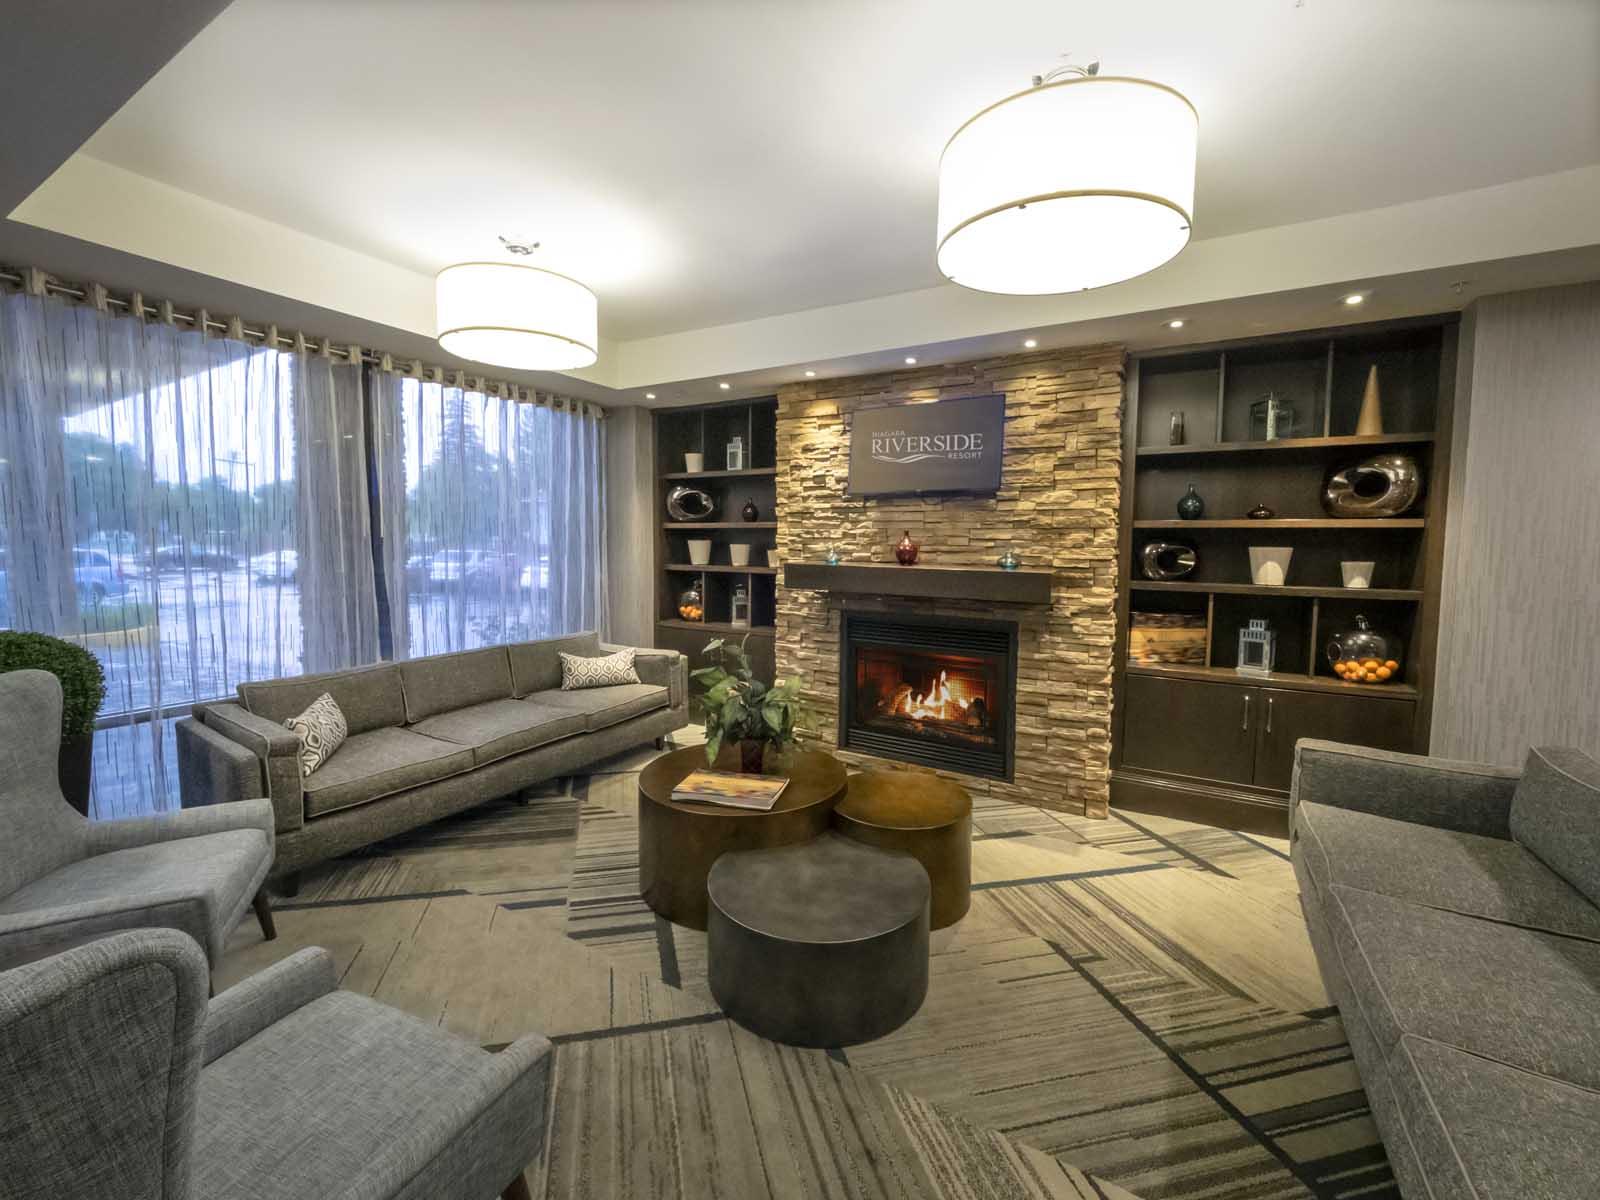 Niagara Riverside Resort - Lobby